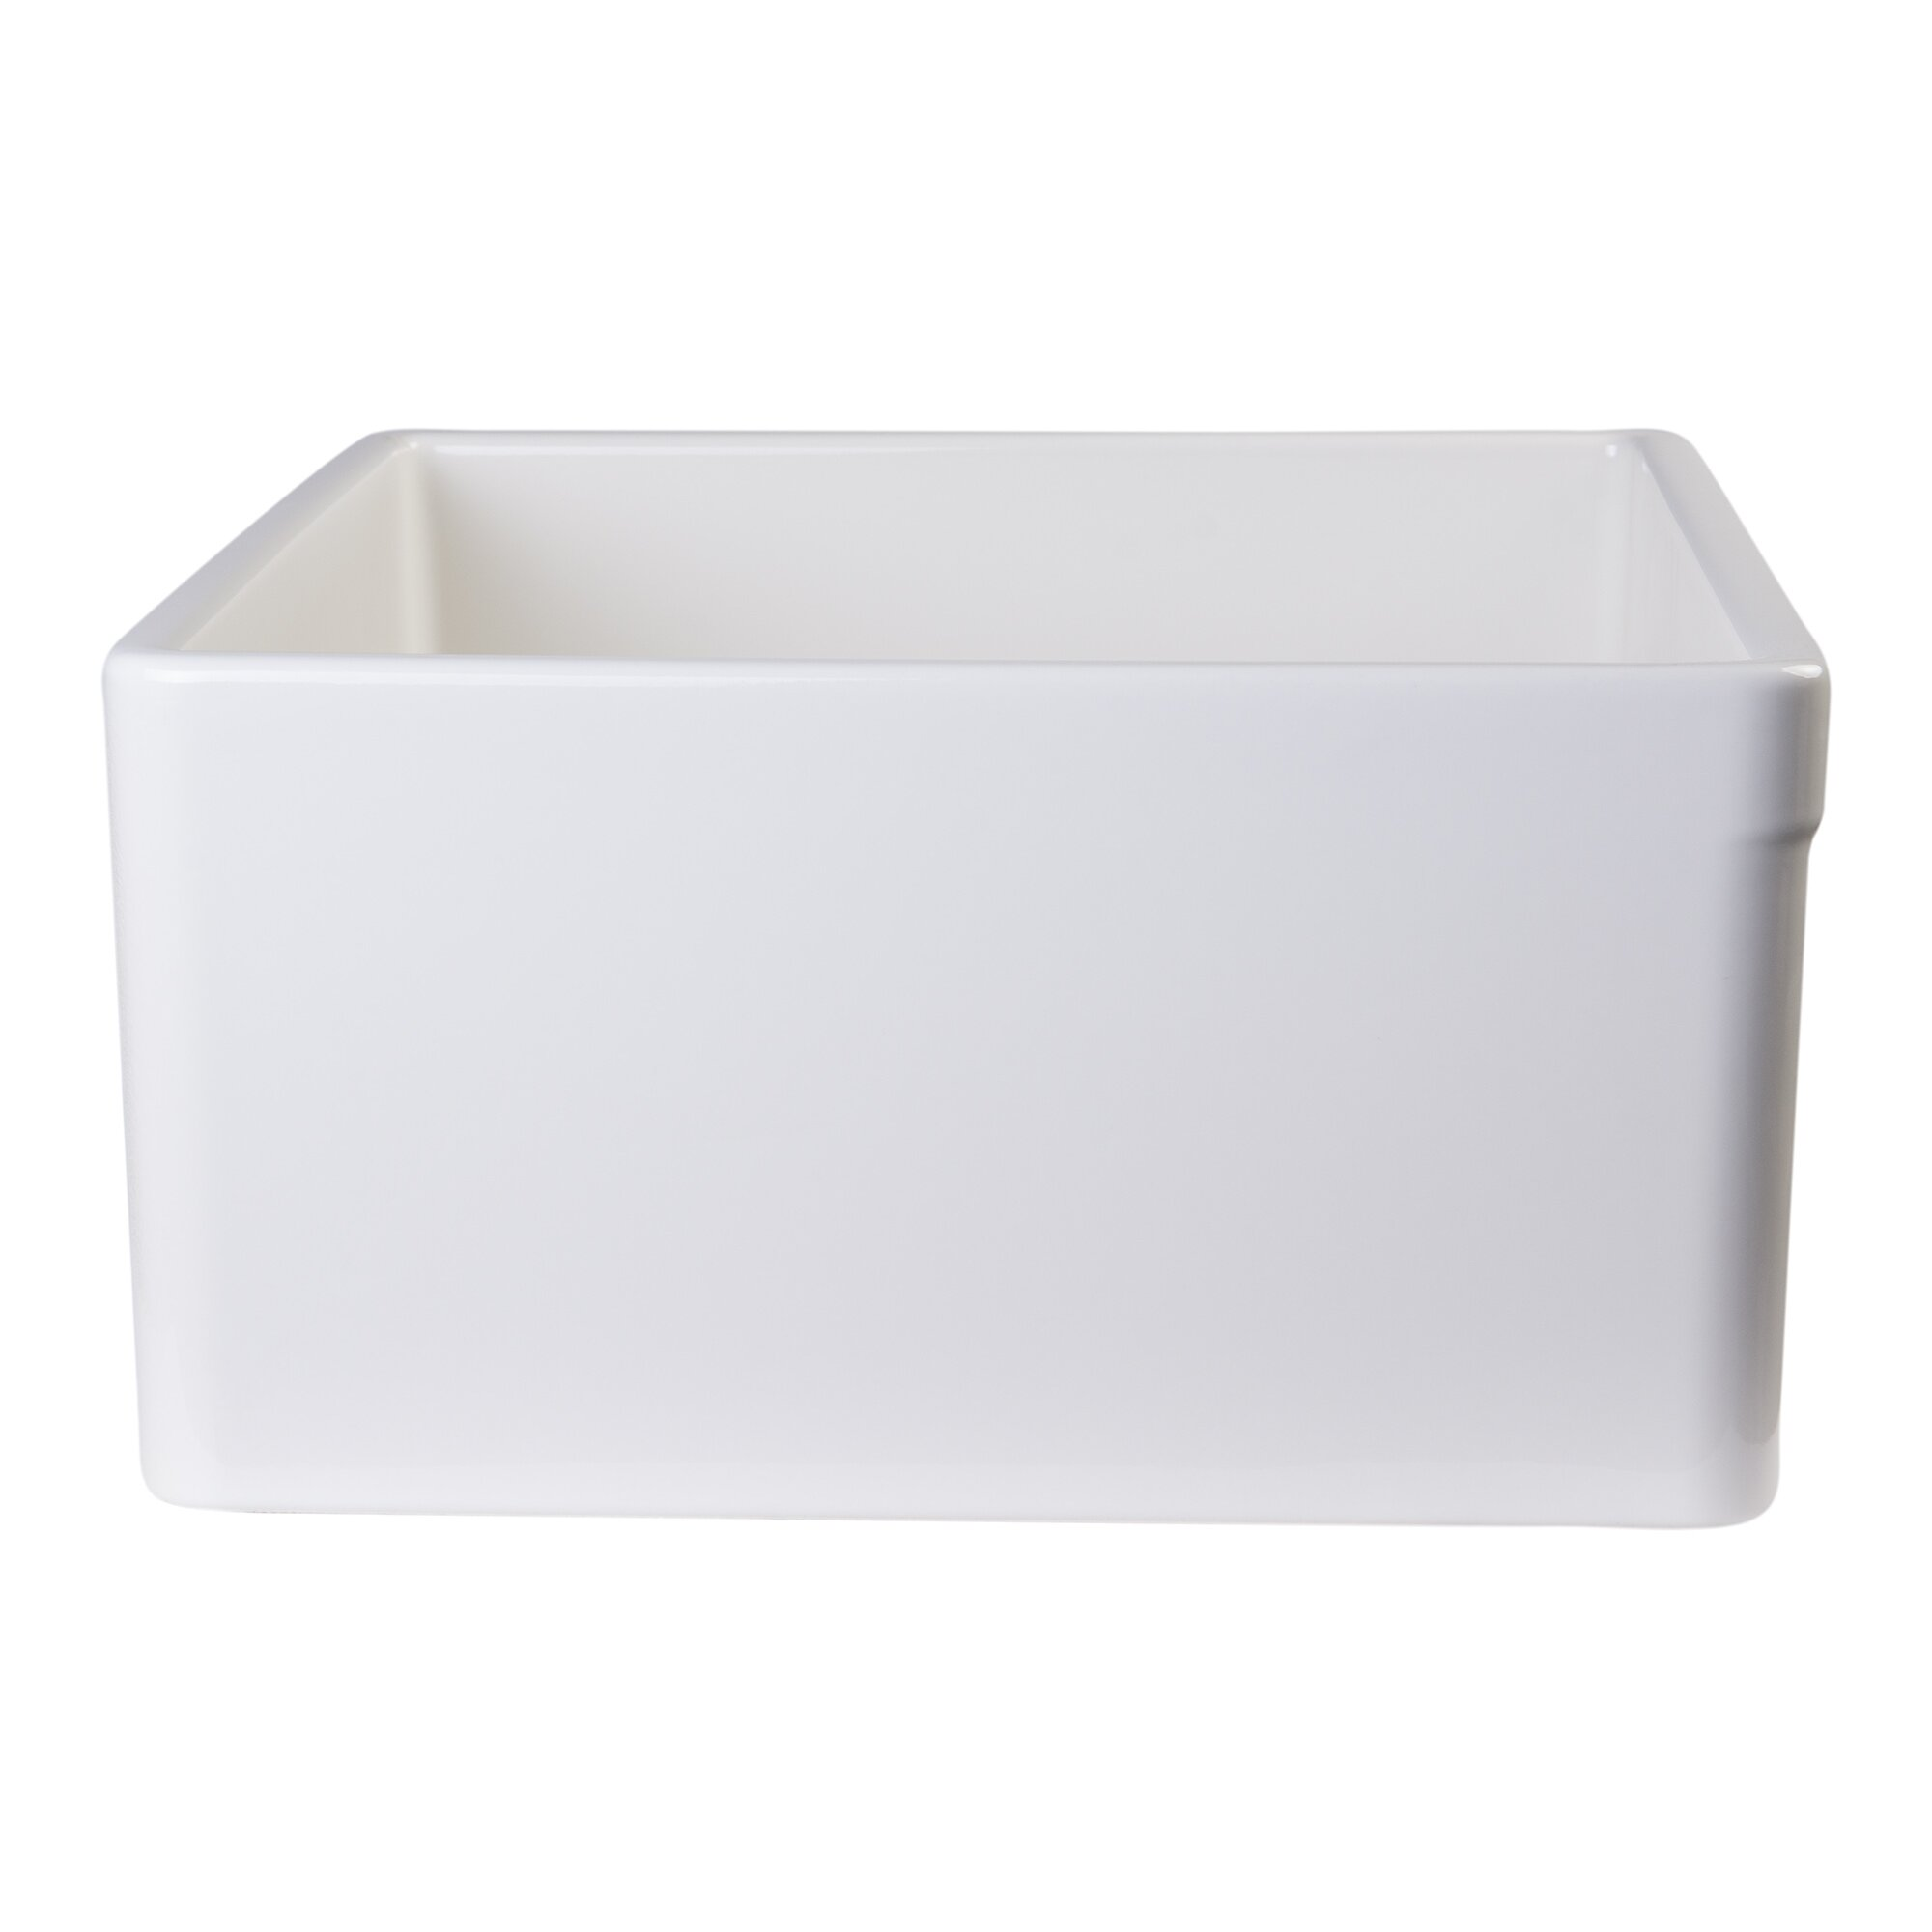 Alfi Brand   X   Single Bowl Farmhouse Kitchen Sink